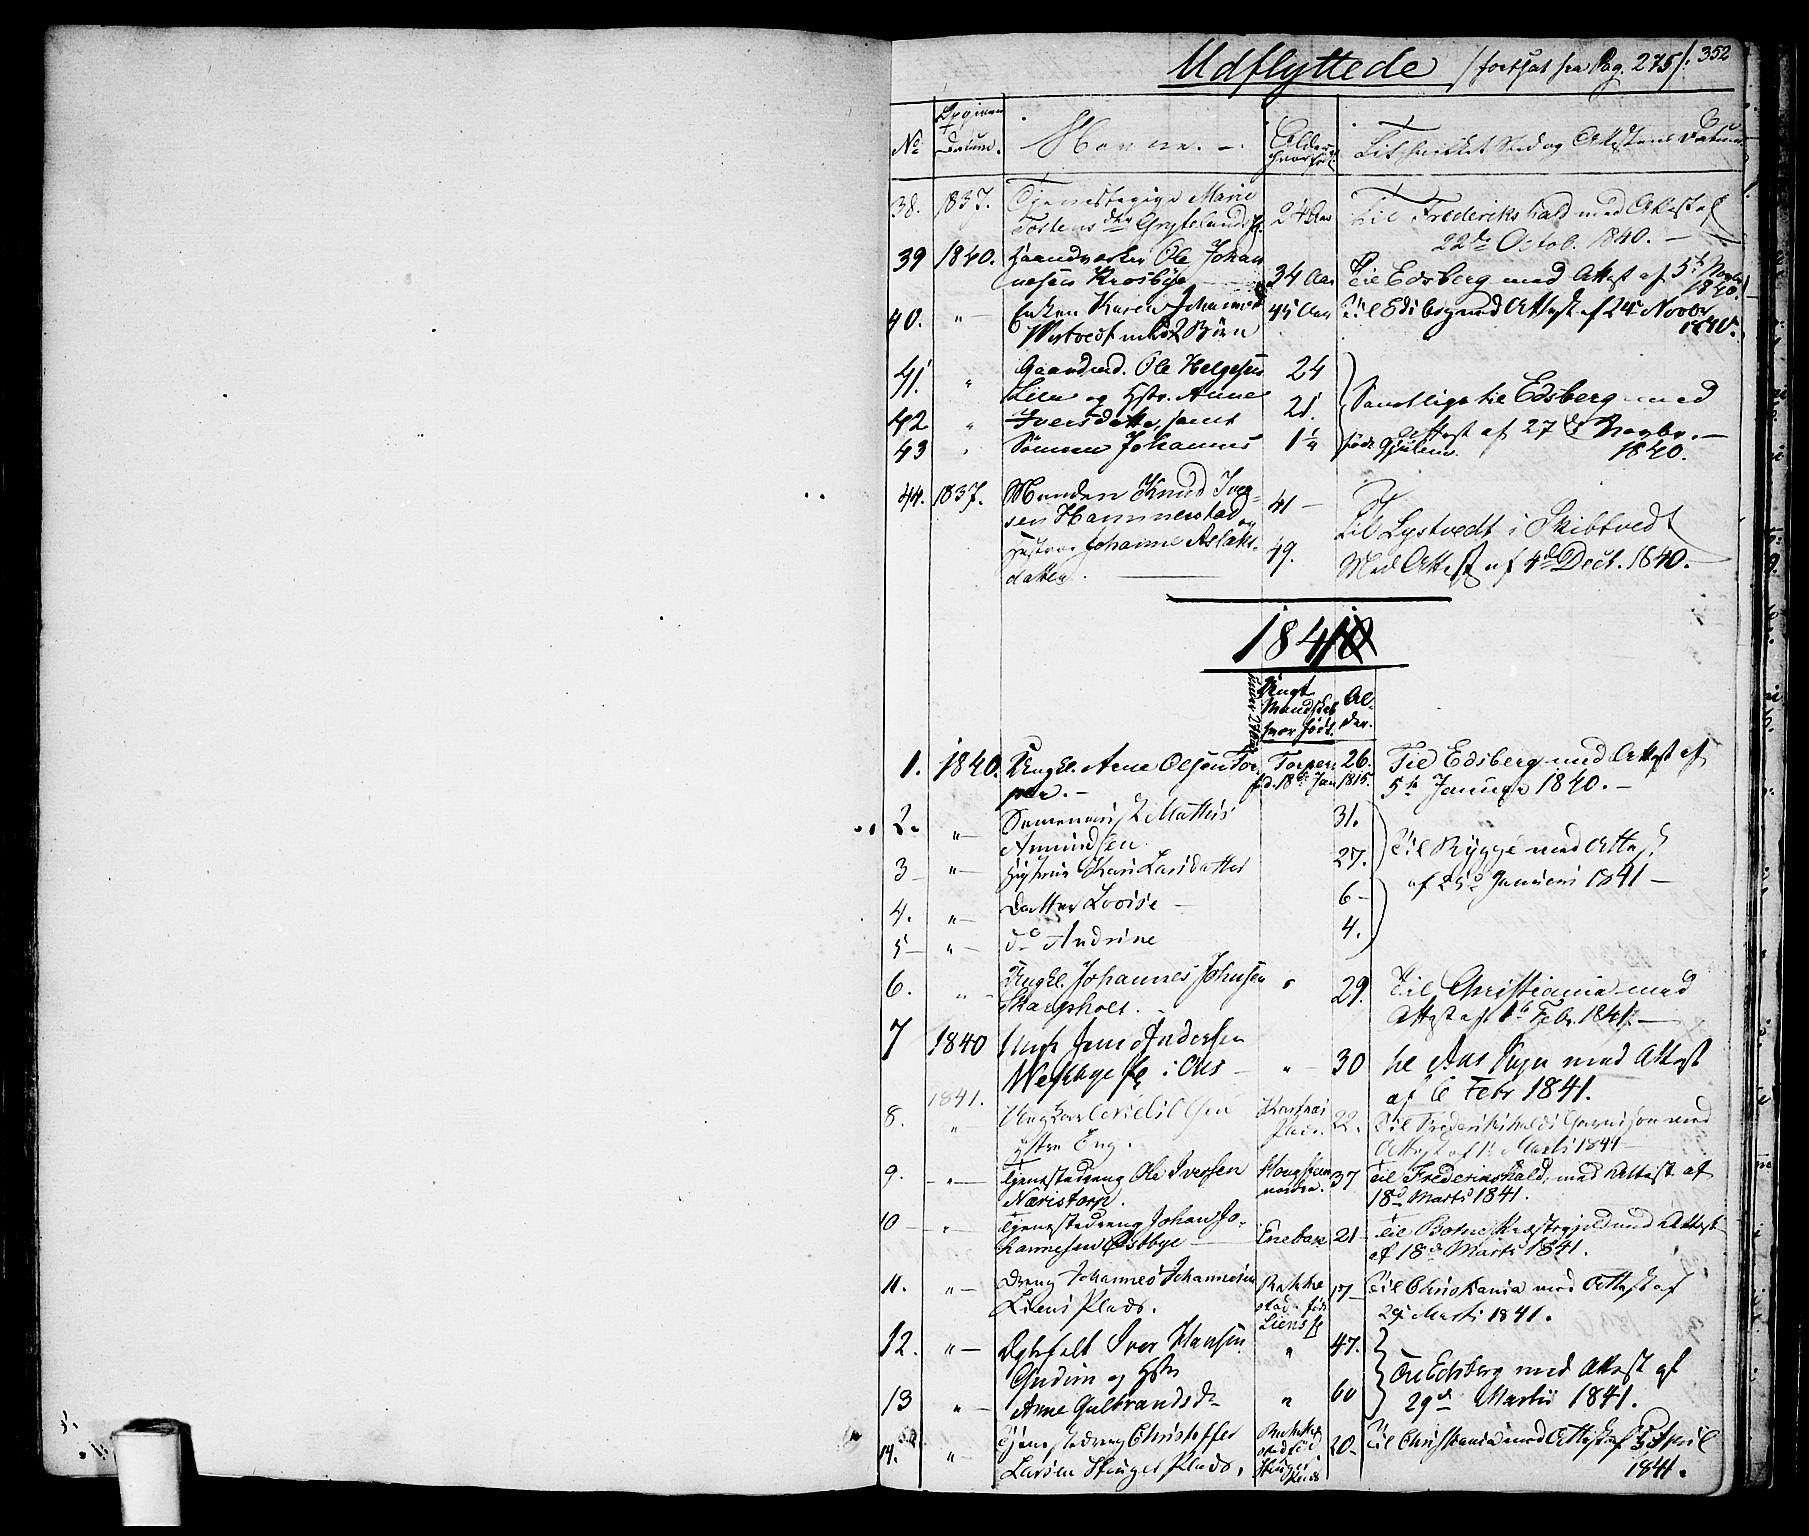 SAO, Rakkestad prestekontor Kirkebøker, F/Fa/L0007: Ministerialbok nr. I 7, 1825-1841, s. 352